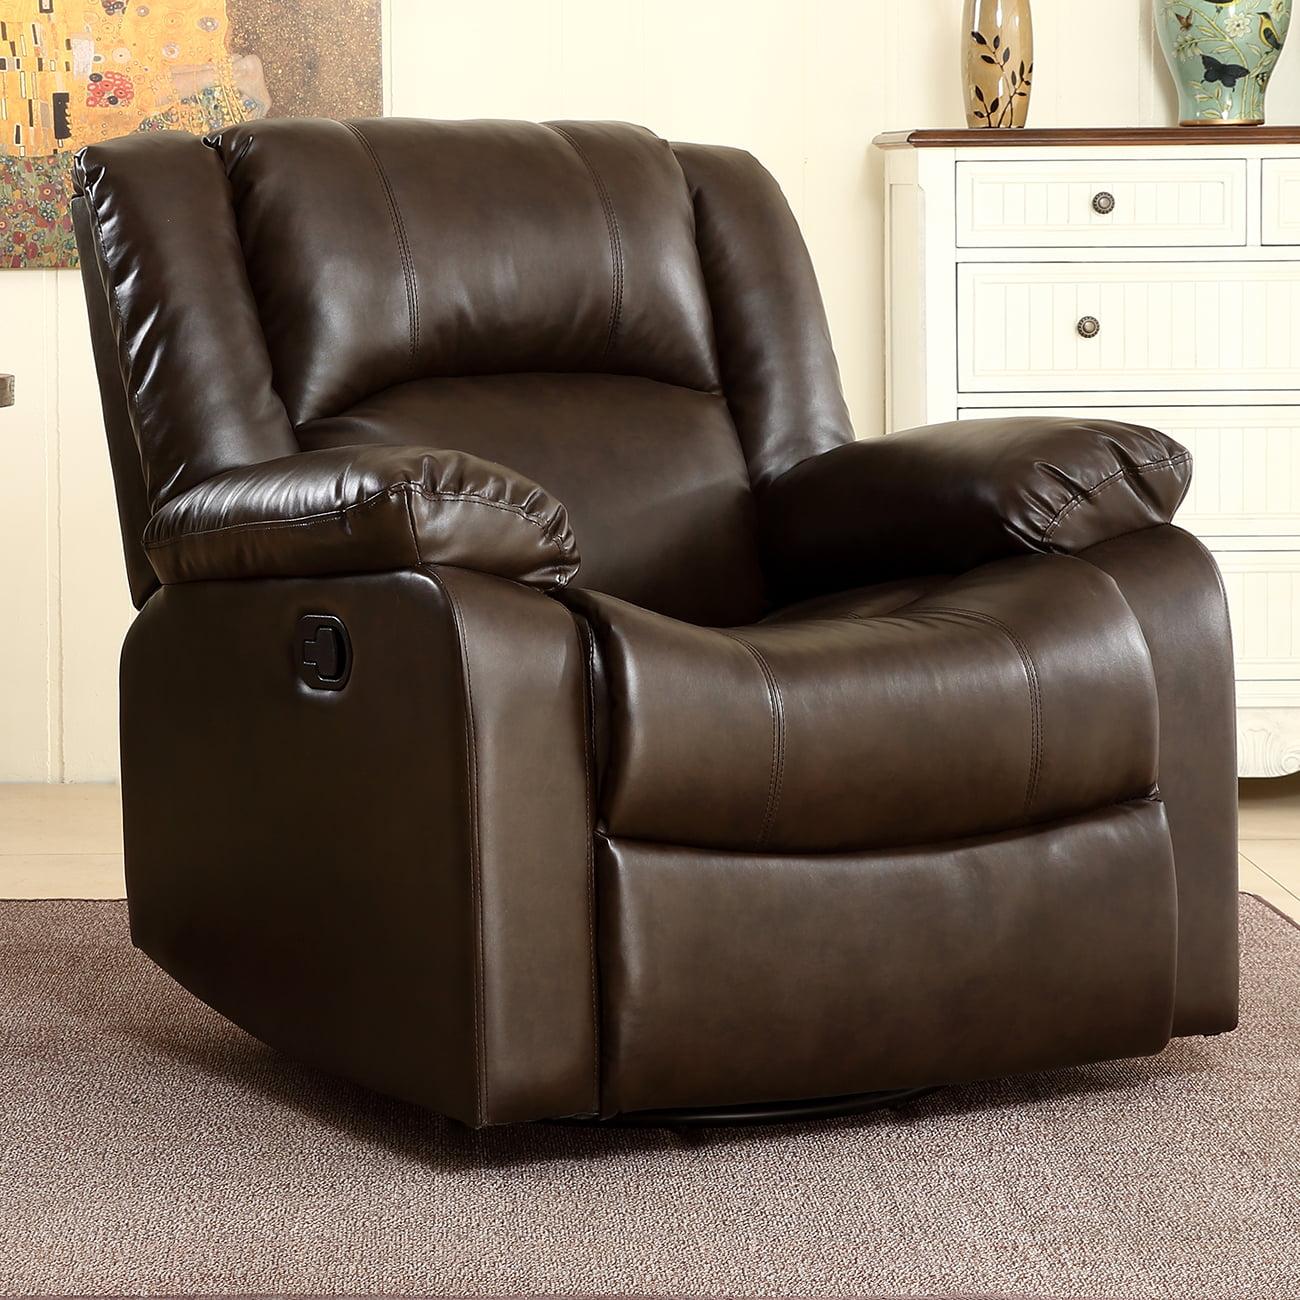 Belleze Faux Leather Rocker / Swivel Glider Recliner Living Room Chair (Brown)